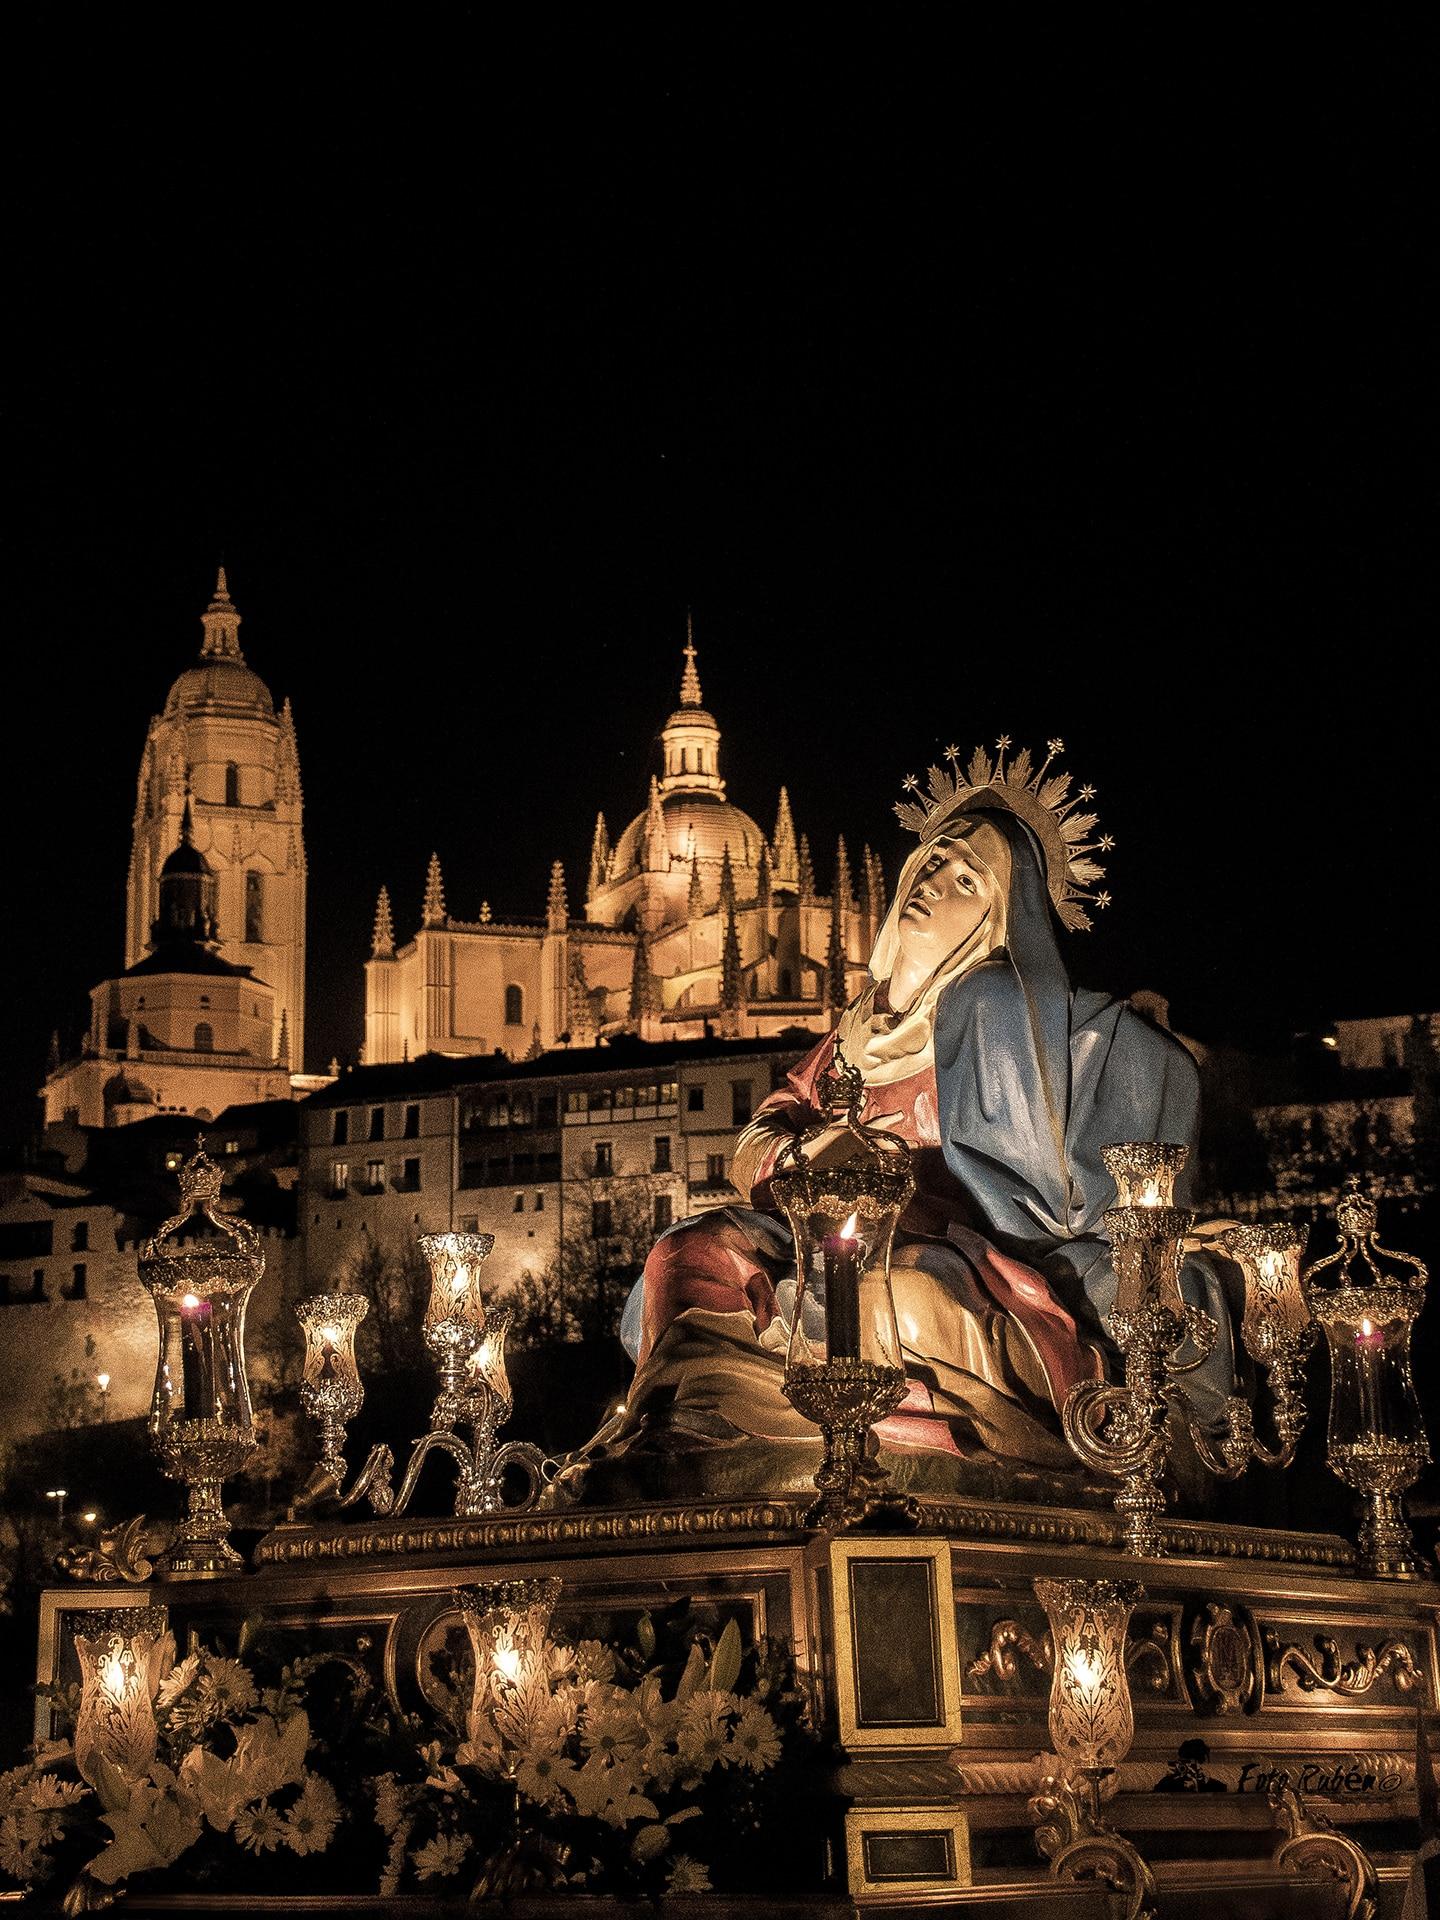 Procesion de Ntra. Madre Marçia Santismima de las Angustias, Segovia1